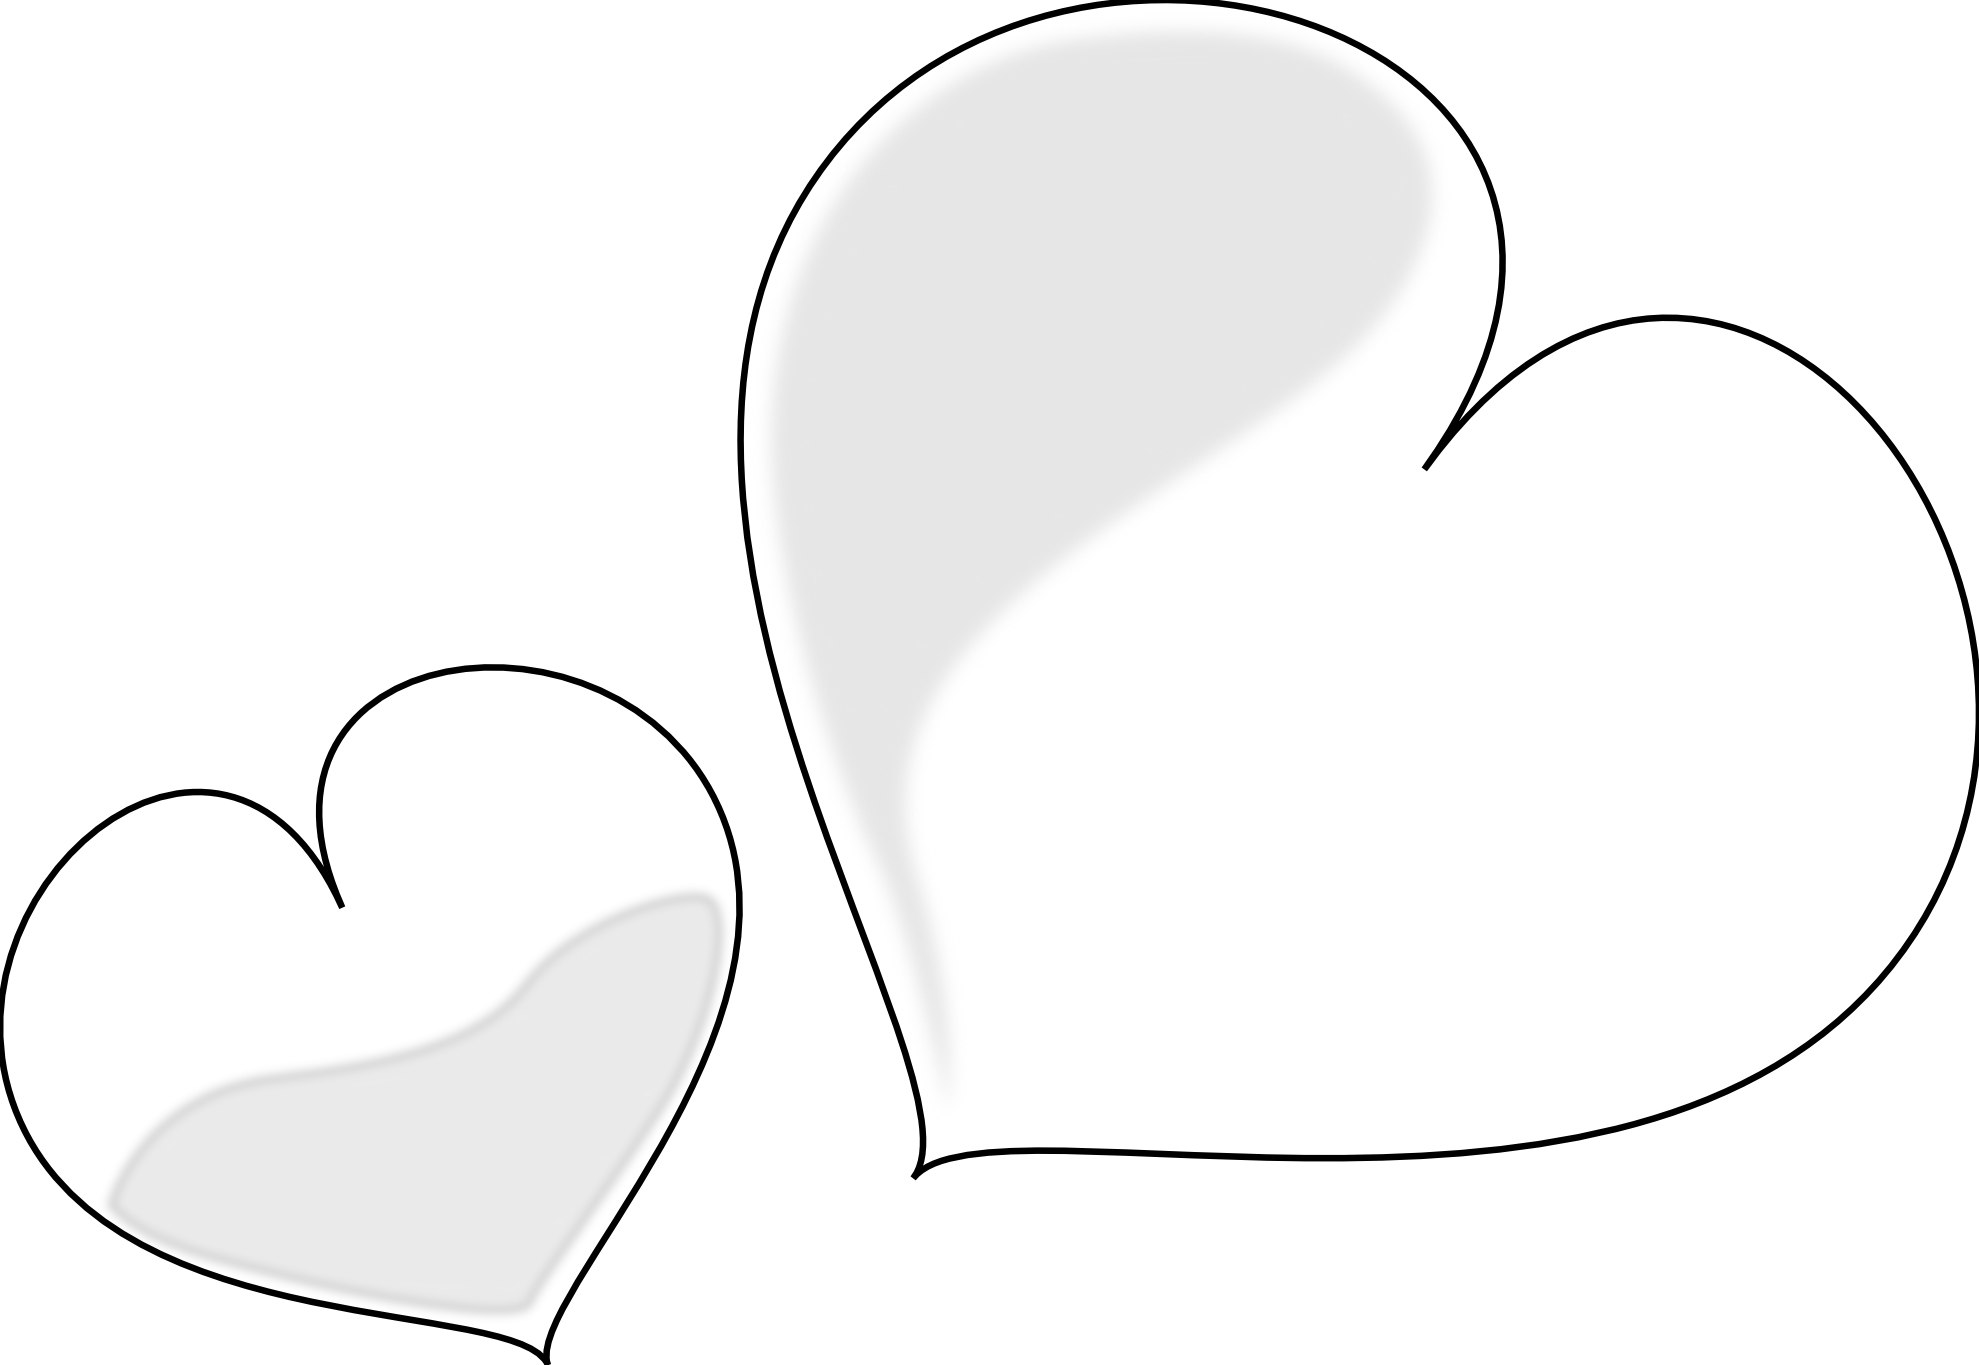 Black and white broken heart clipart svg freeuse stock Broken Heart Clipart Black And White | Clipart library - Free - Clip ... svg freeuse stock